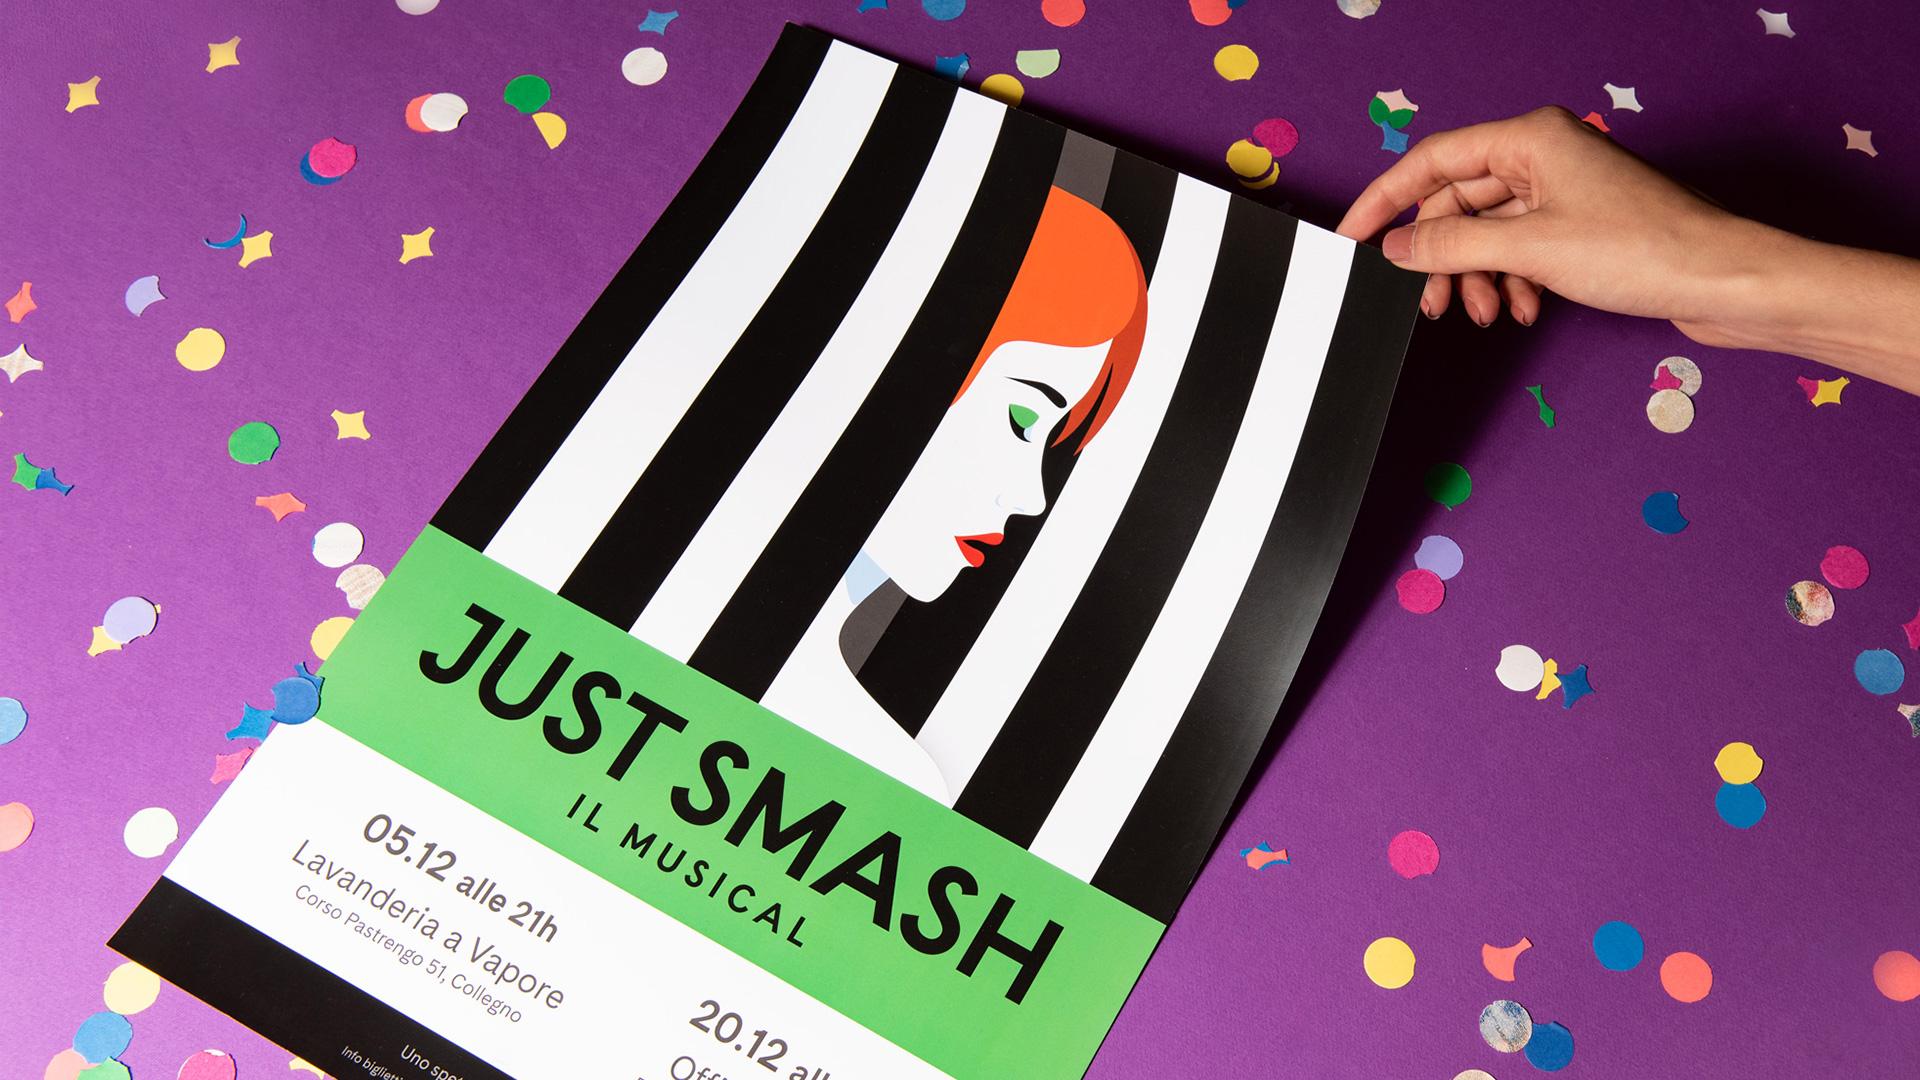 just-smash-illustrations